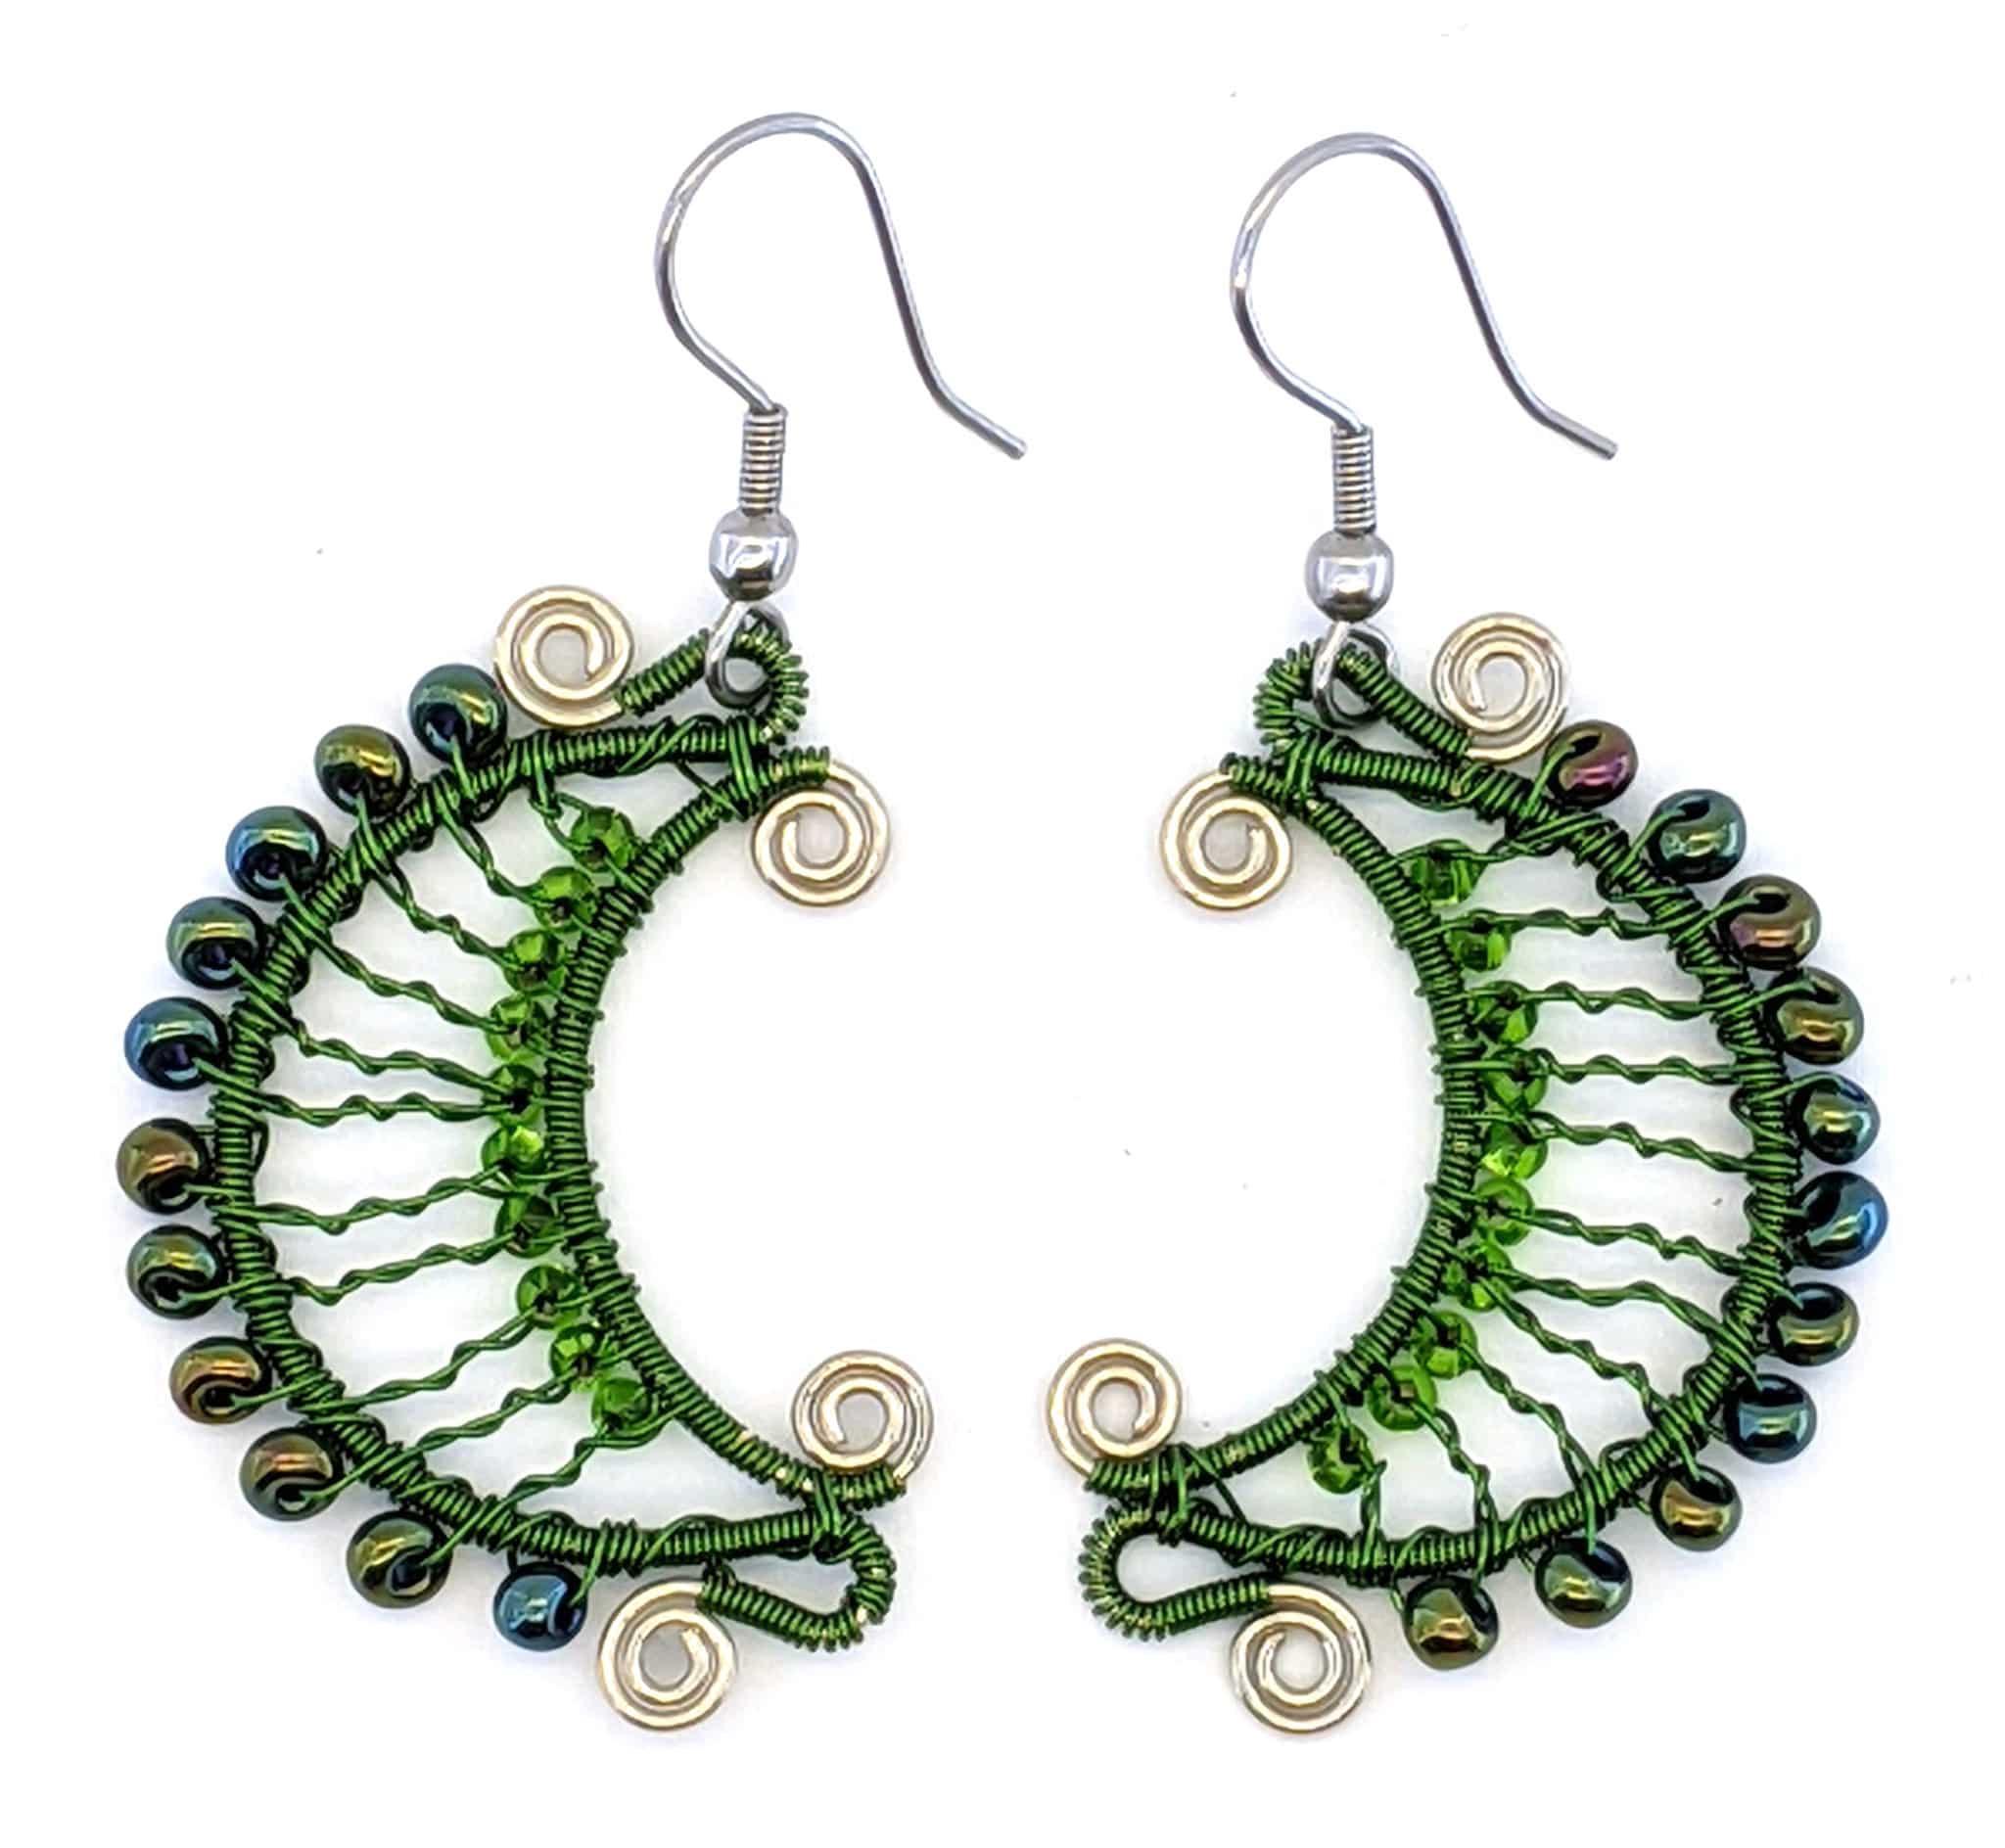 Crescent Moon Earrings - Green